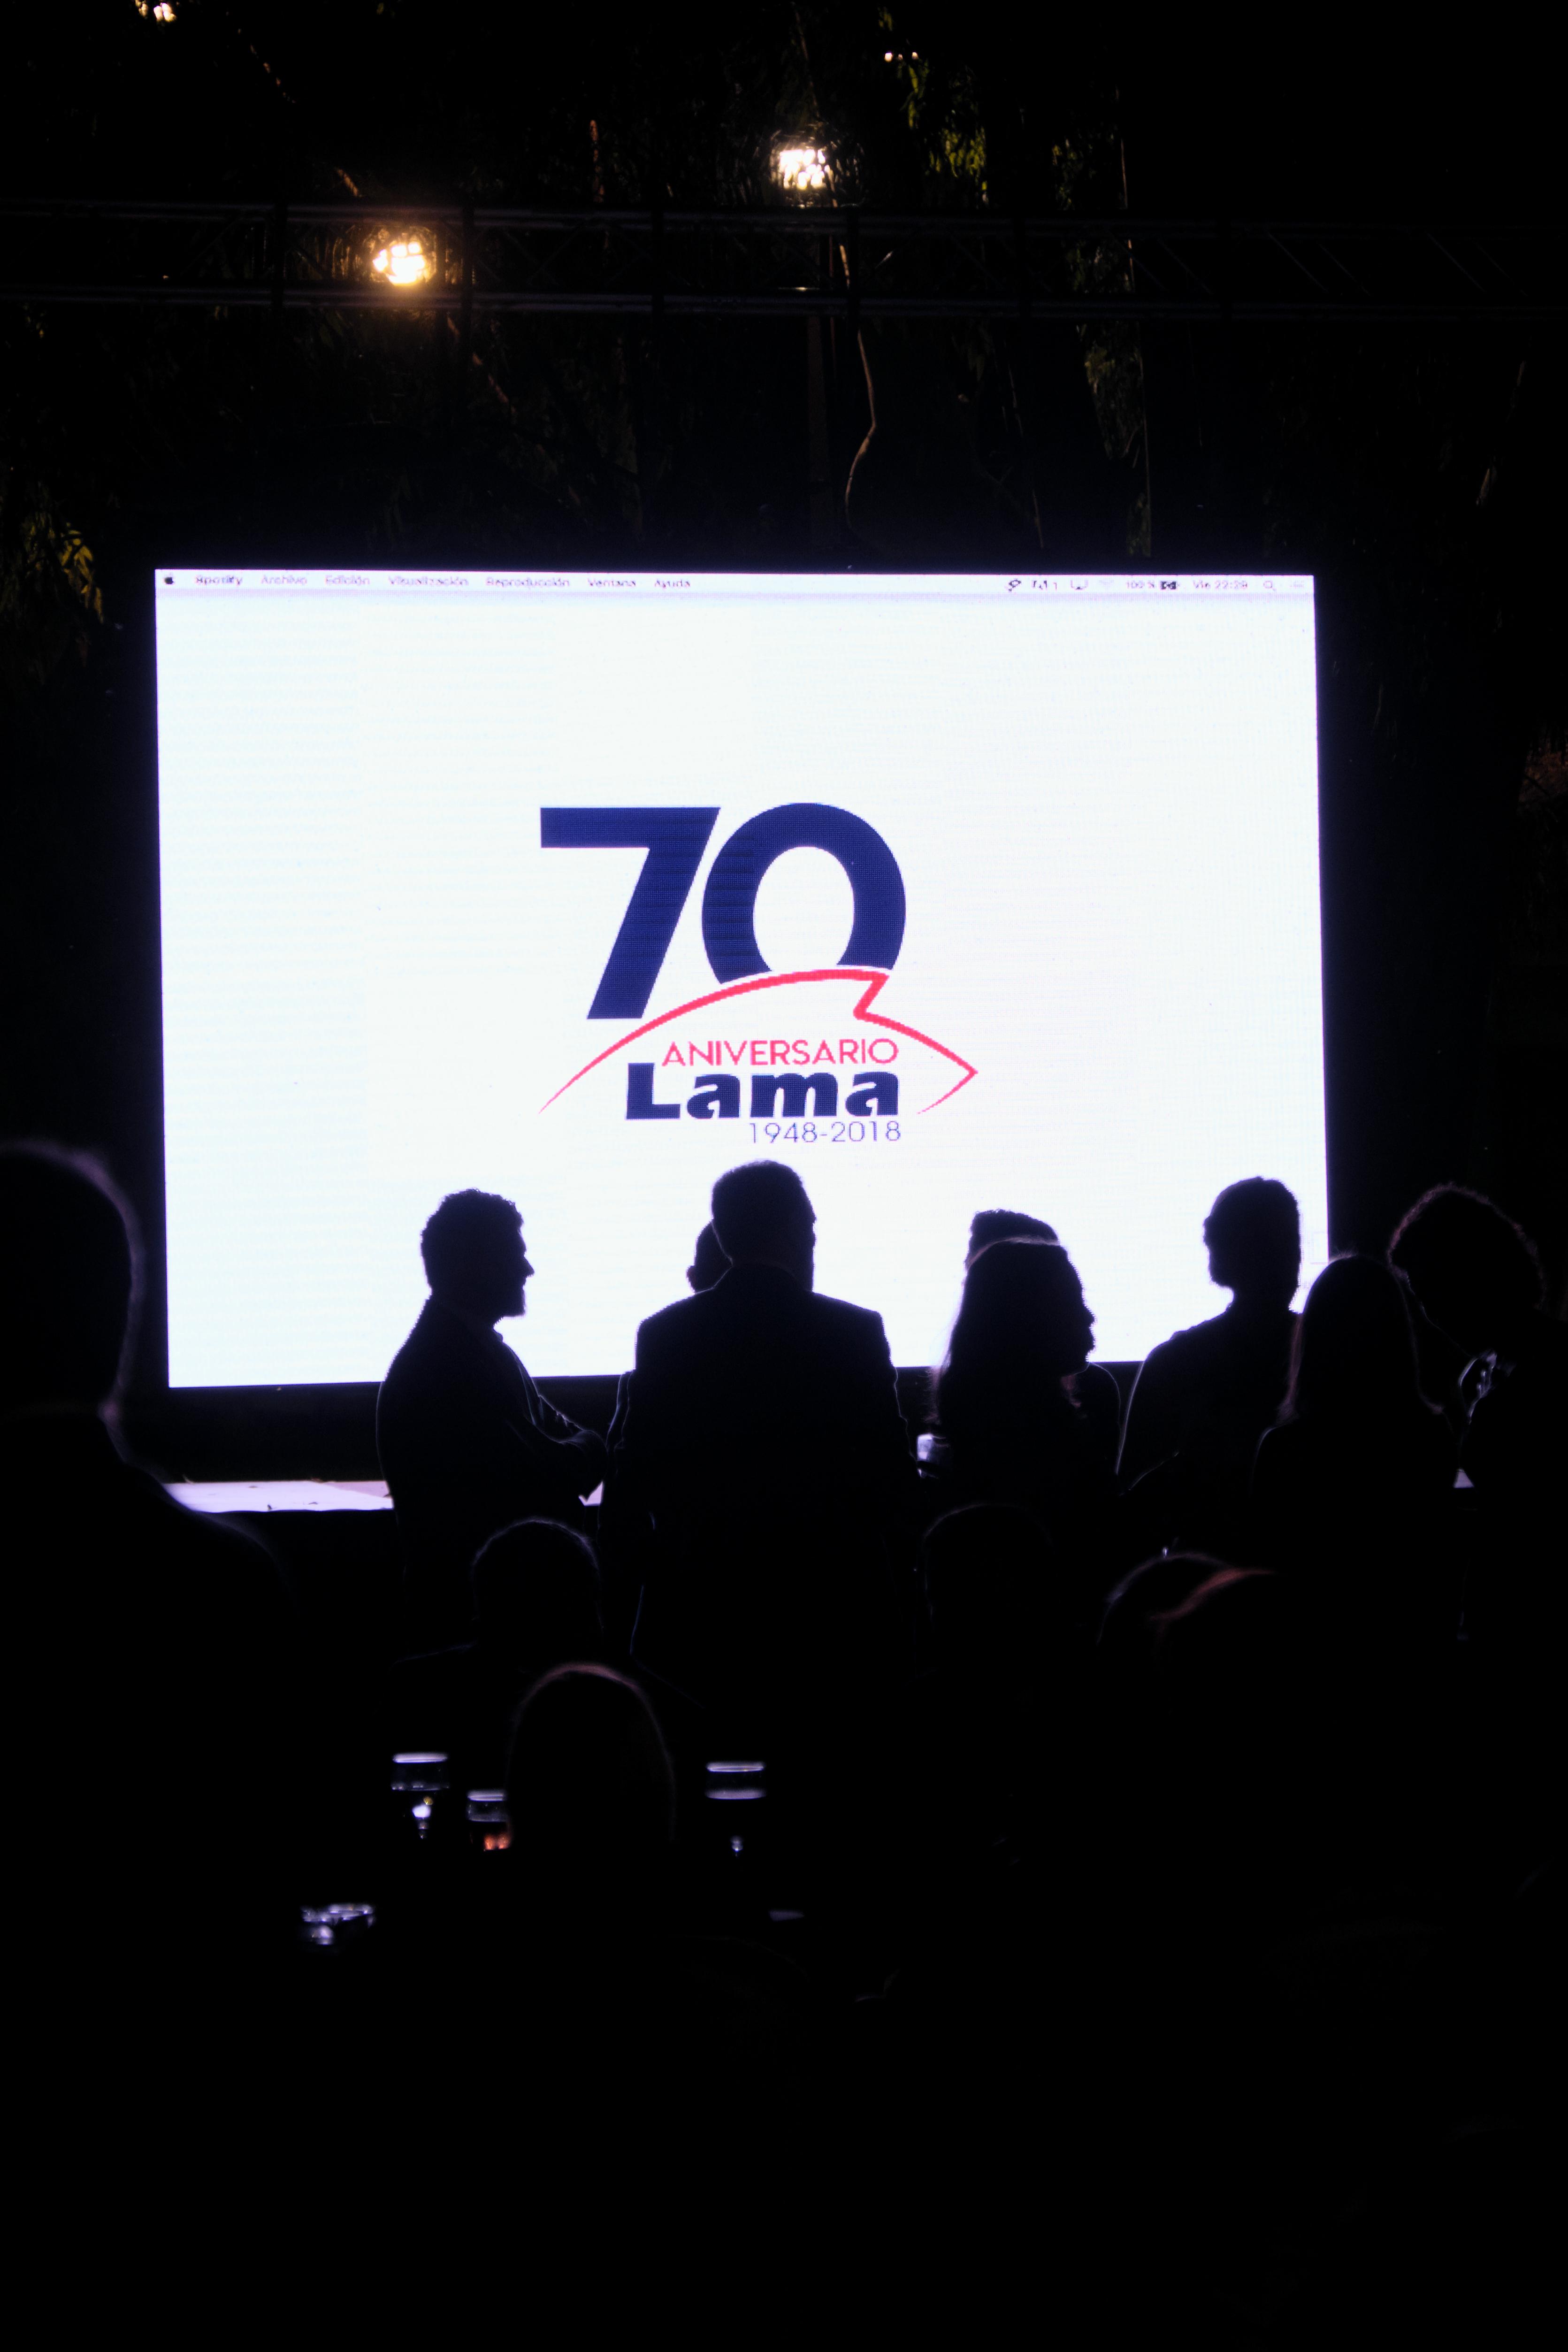 Lama-70th-anniversary